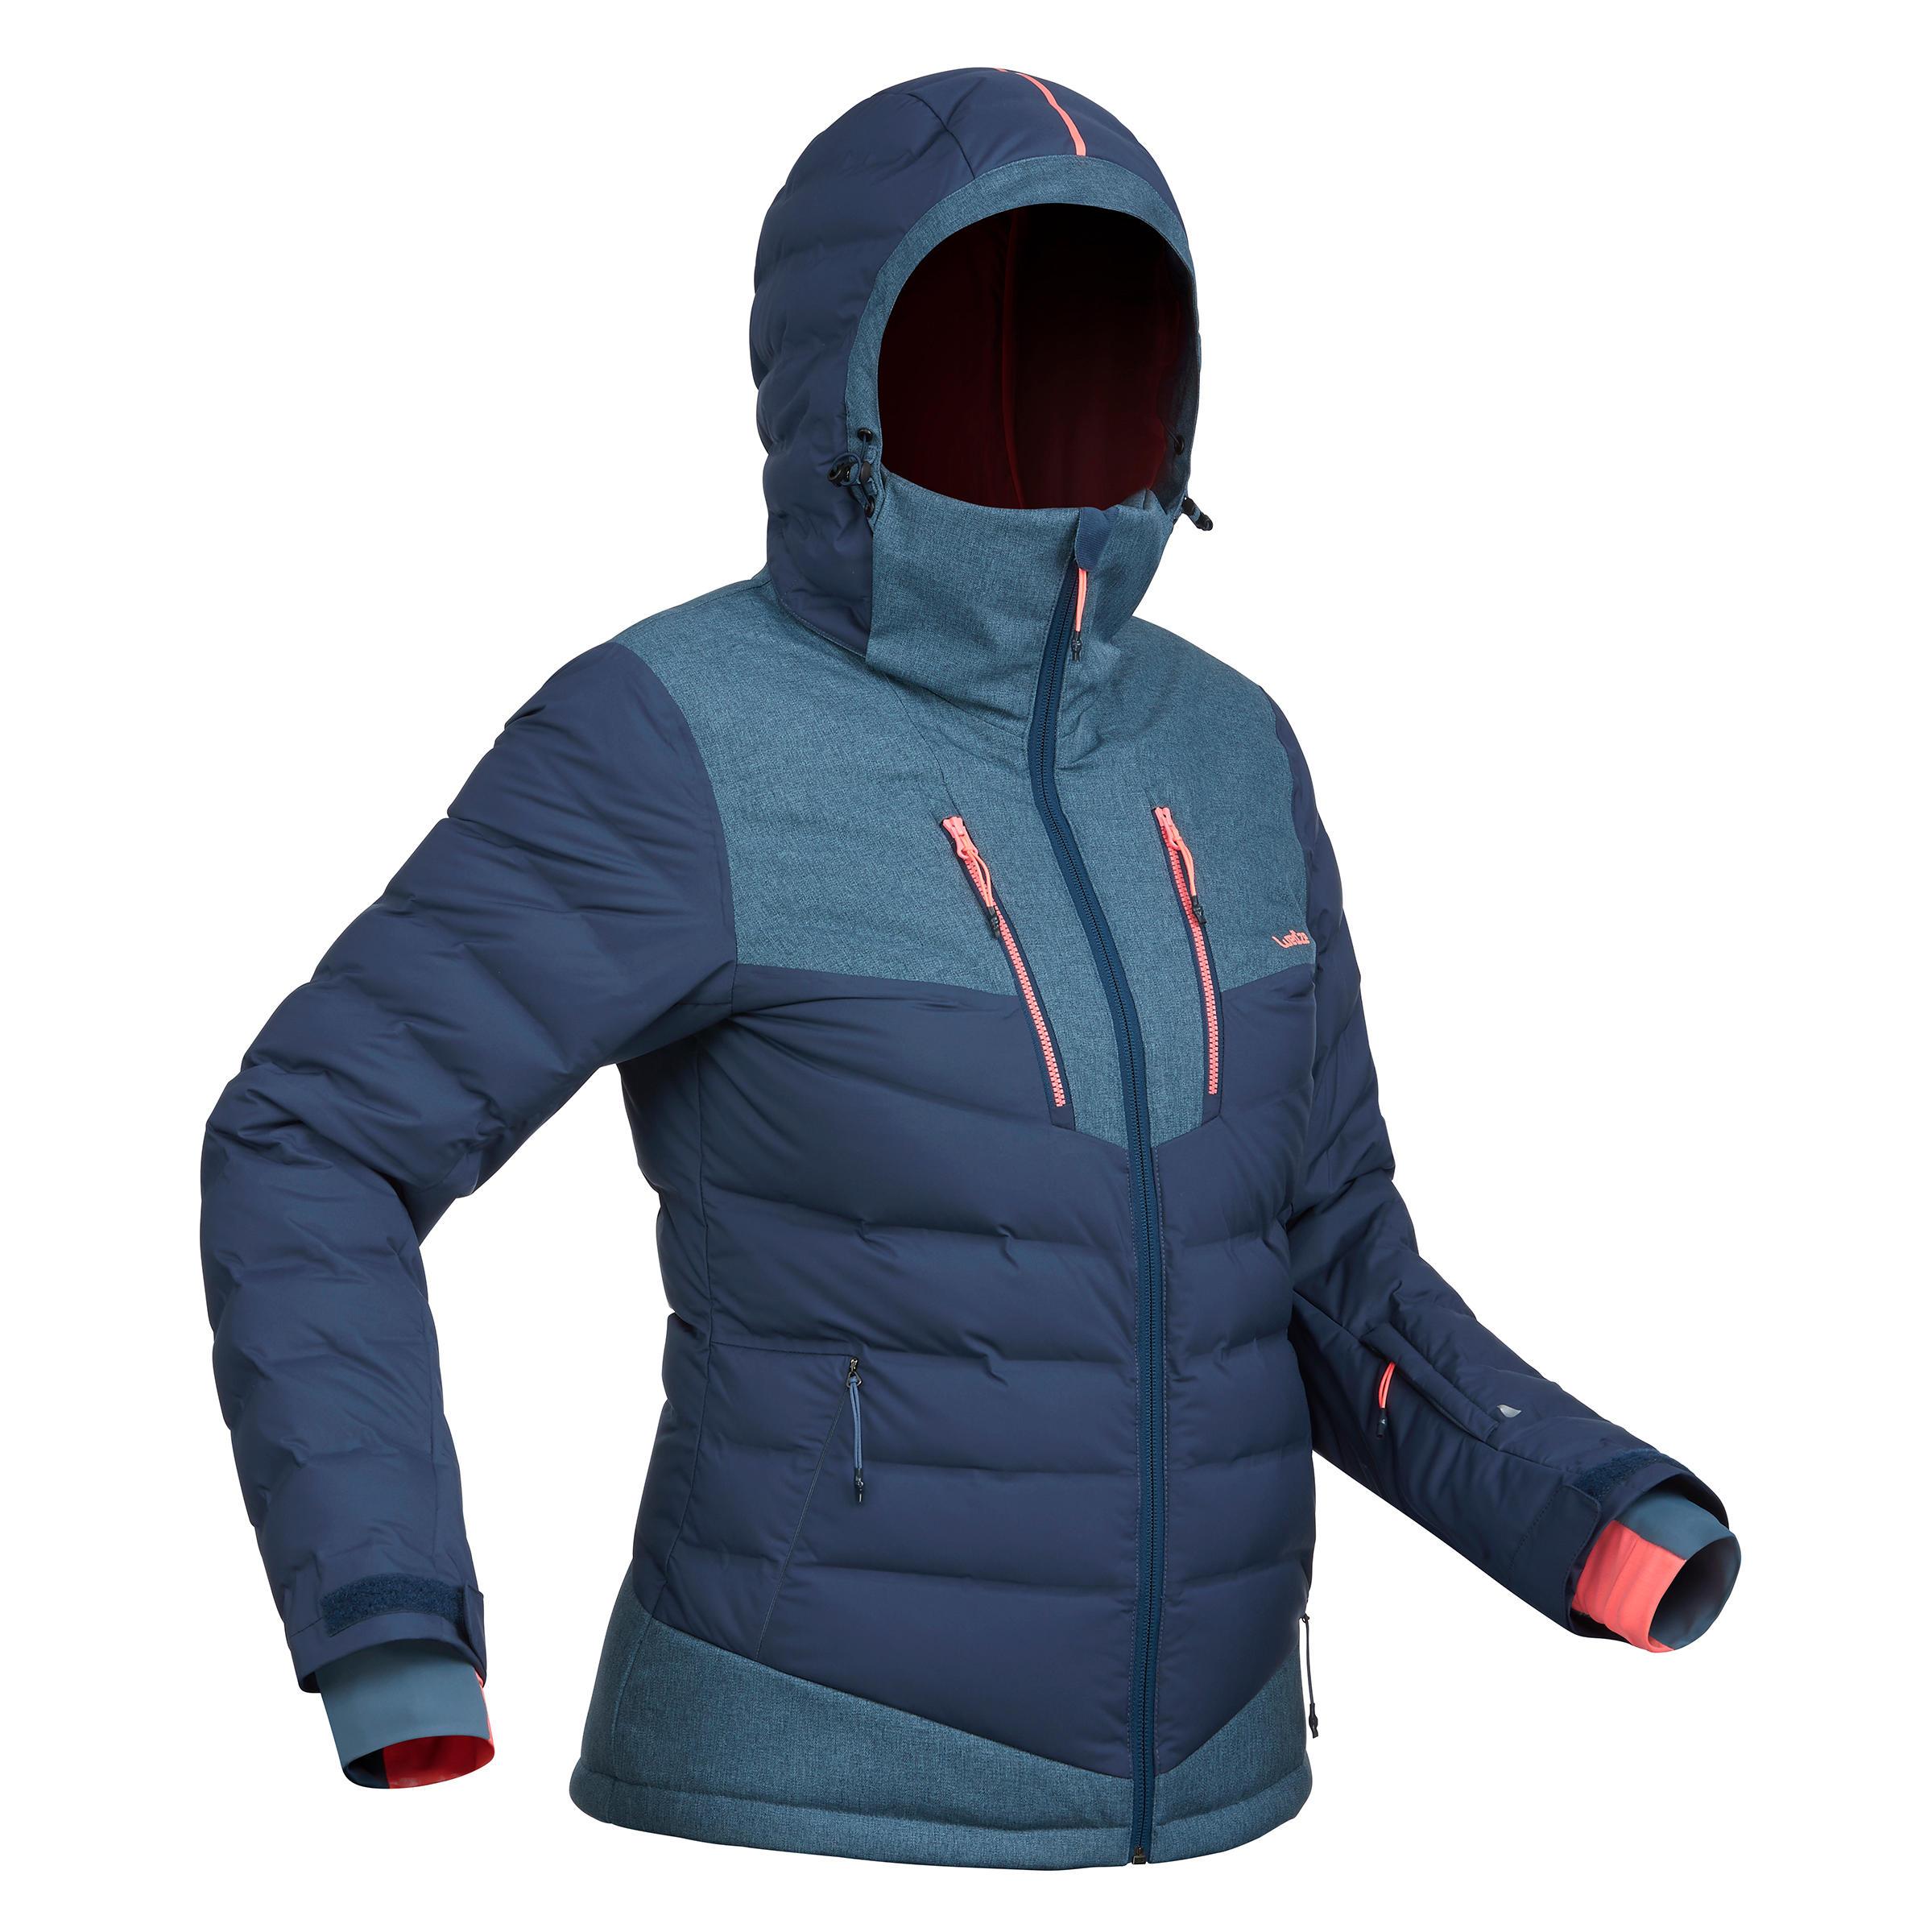 Wed'ze Ski-jas dames voor pisteskiën SKI-P JKT 900 Warm marineblauw